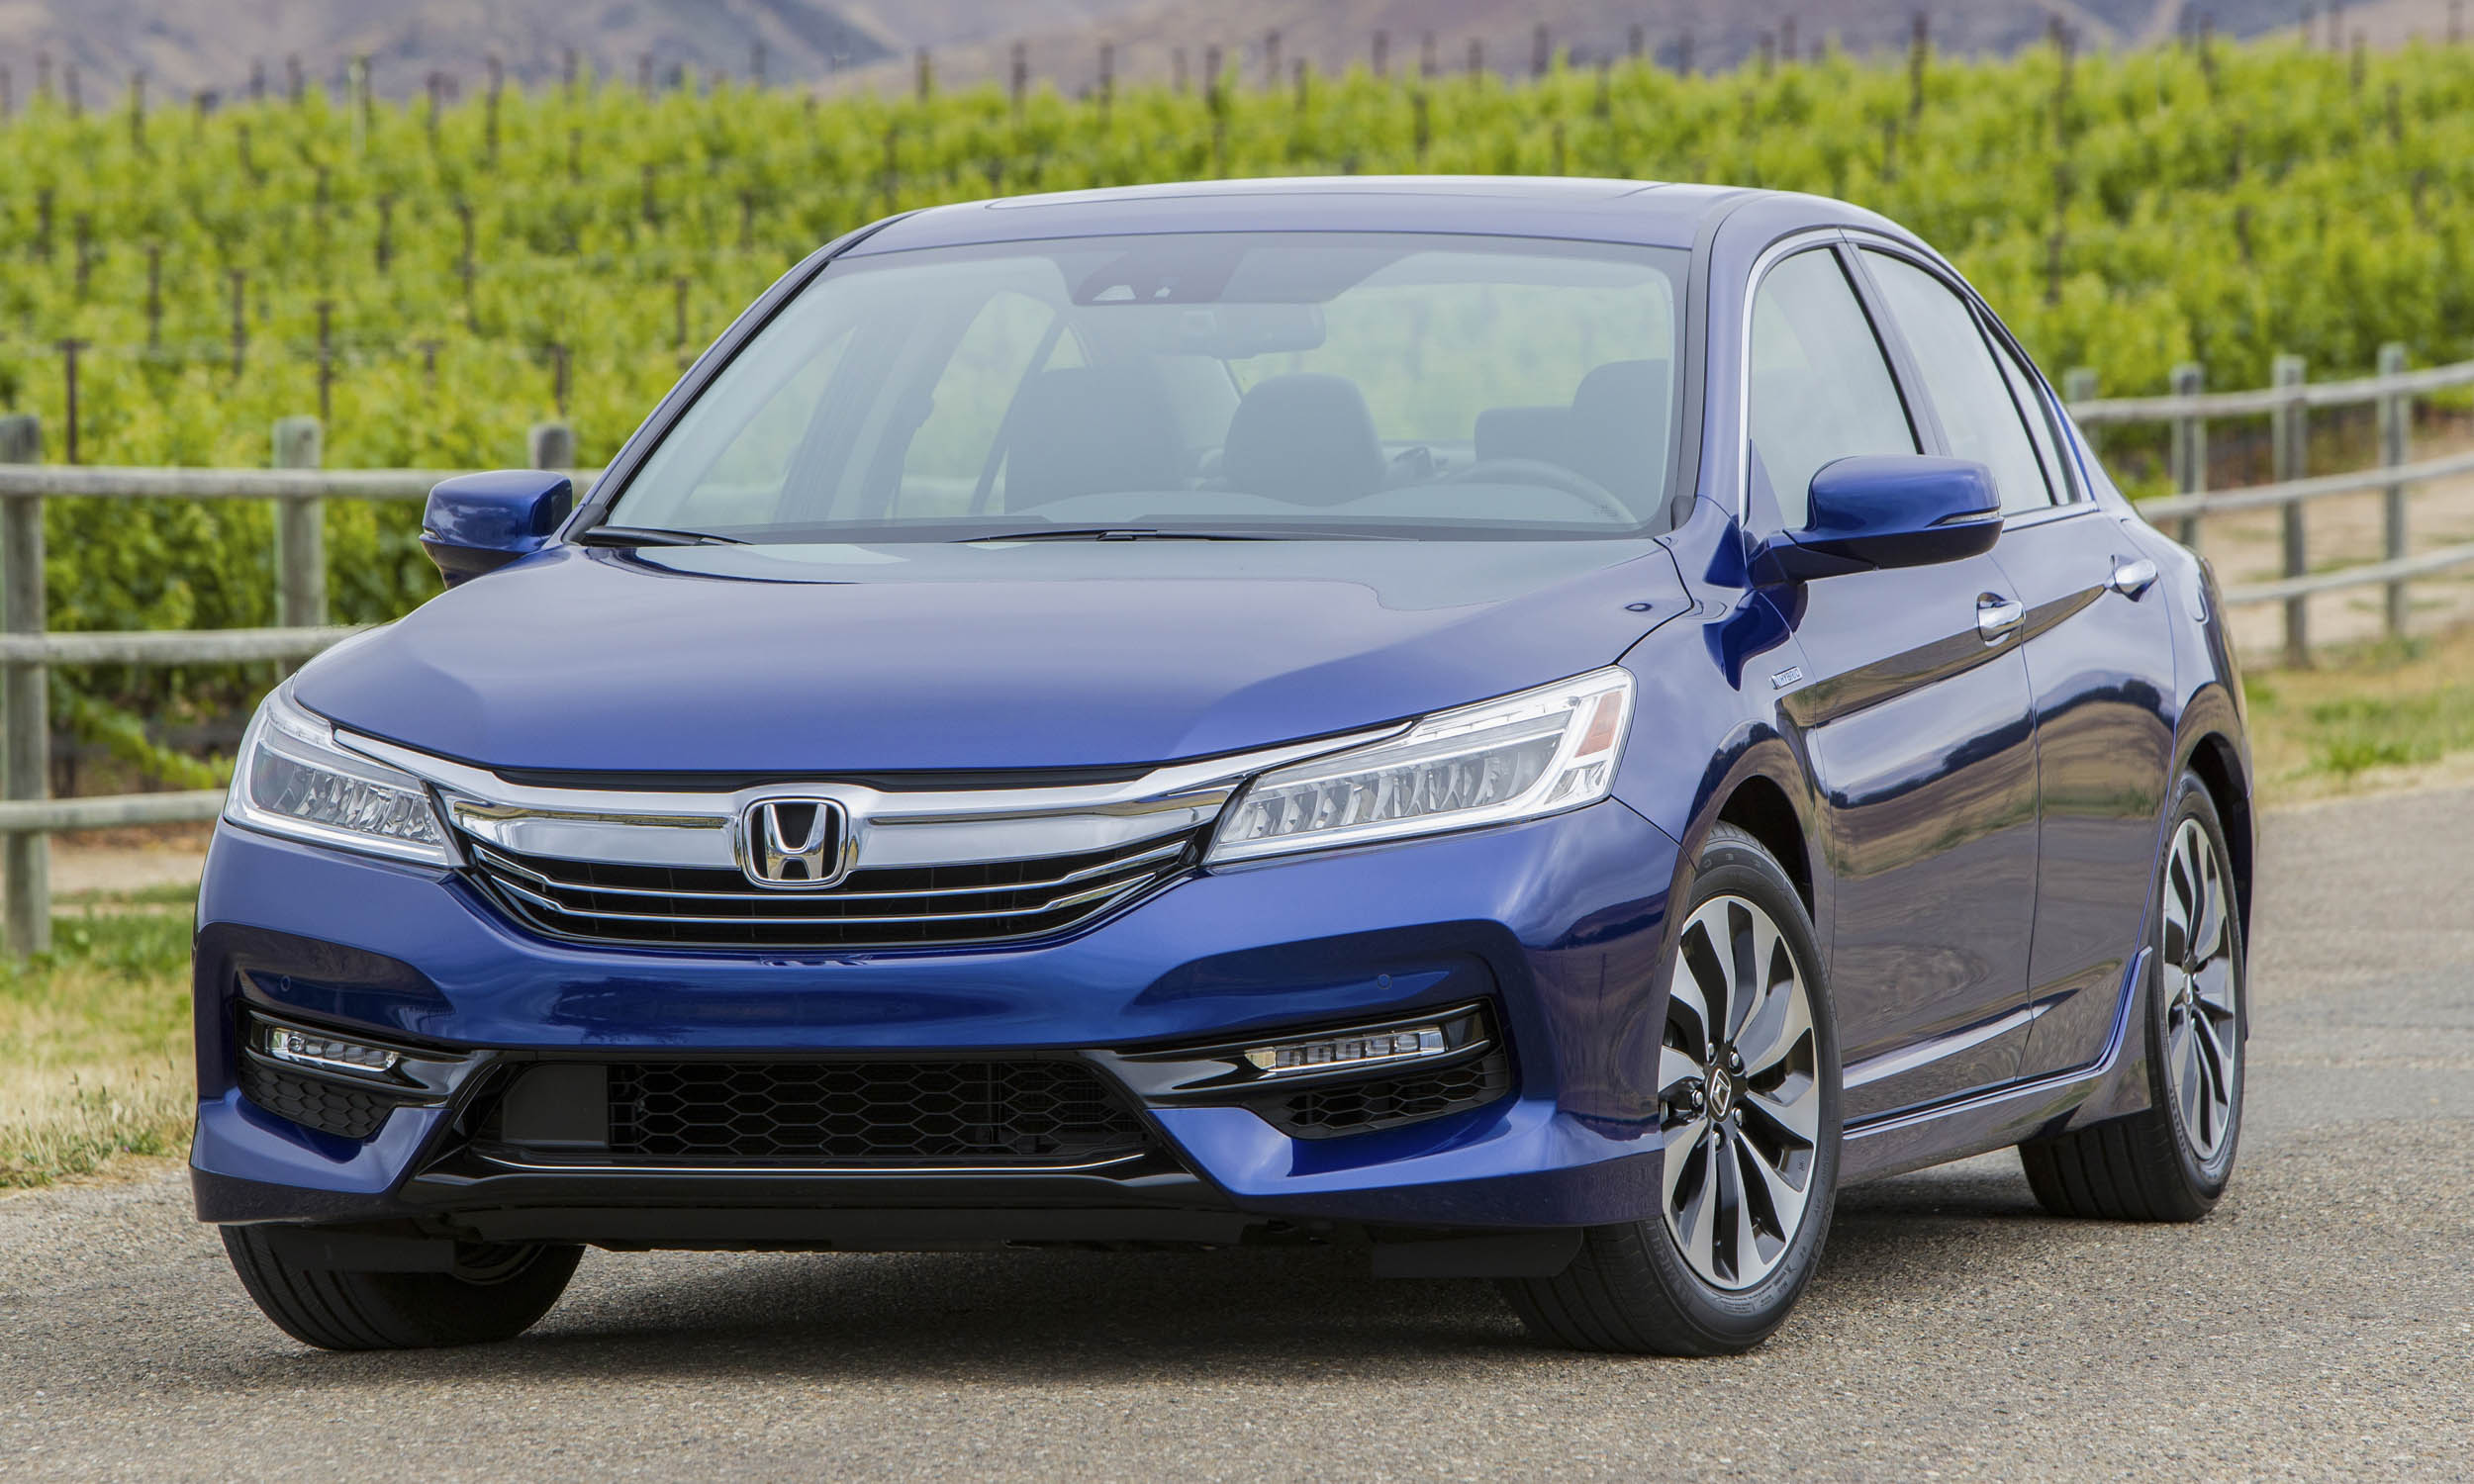 Honda Accord 0 60 >> Honda Accord Hybrid Performance 0 60 | Autos Post